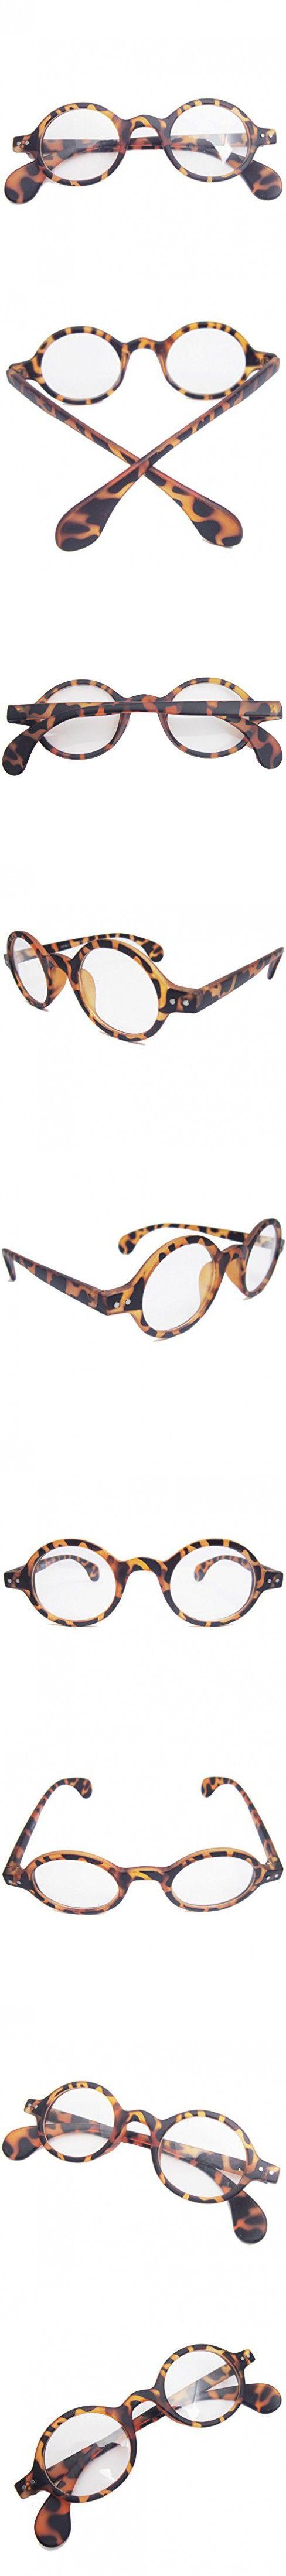 Retro Prescription Eyewear Glasses Small Round Optical Eyeglass Frame (Leopard)